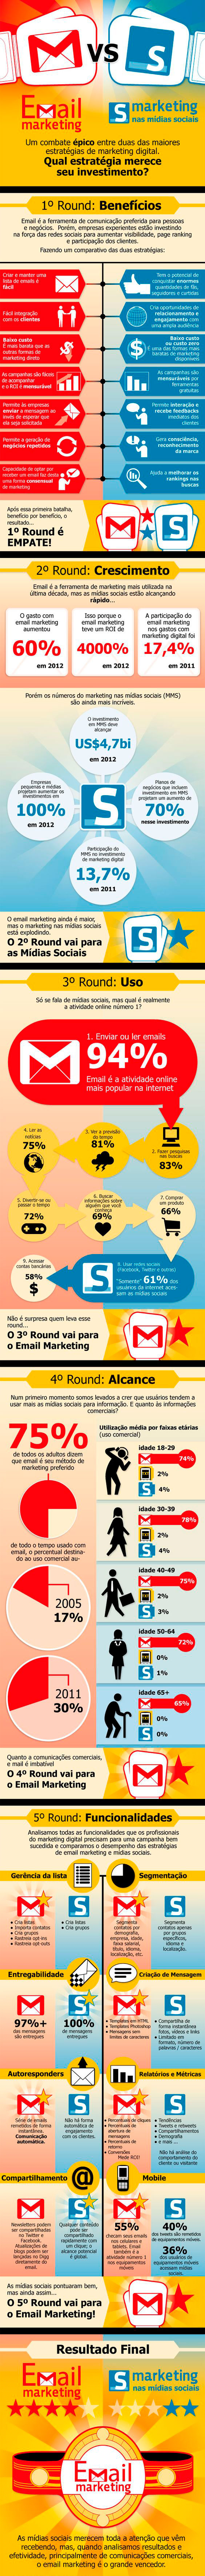 email-mkt-vs-social